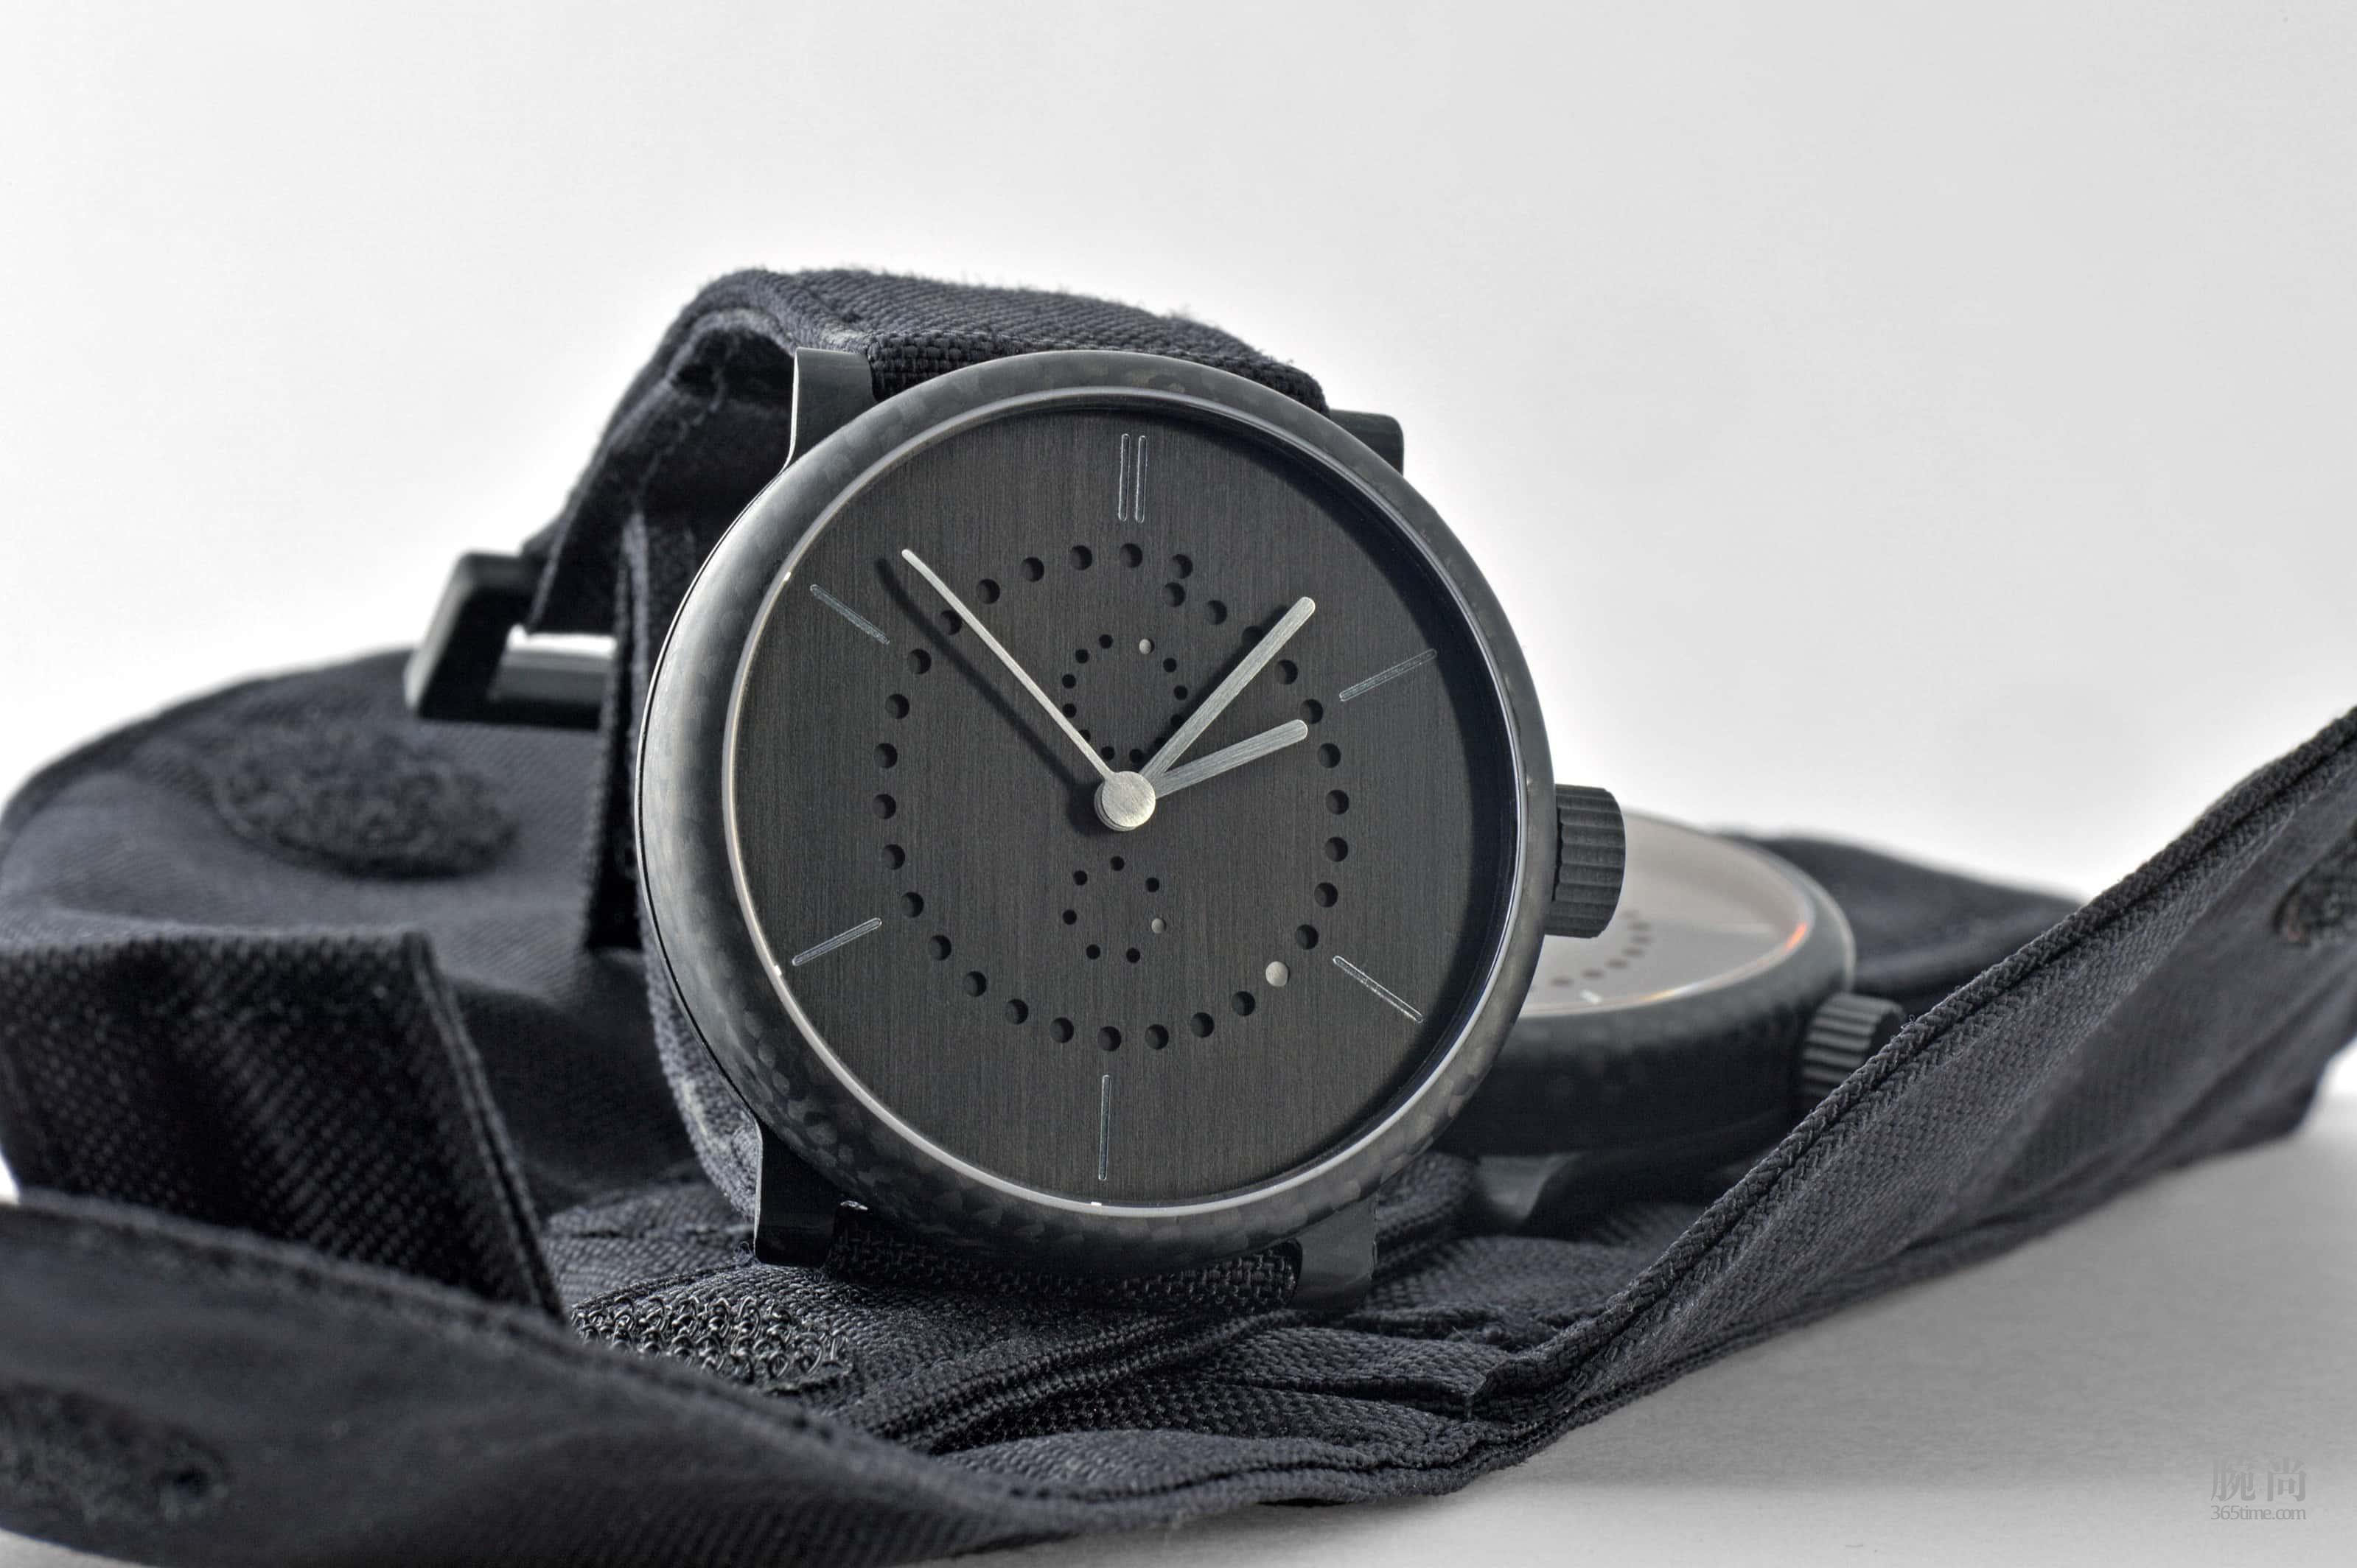 carbon-fiber-annual-calendar-watch-ochs-und-junior-4_RGB-3198px.jpg